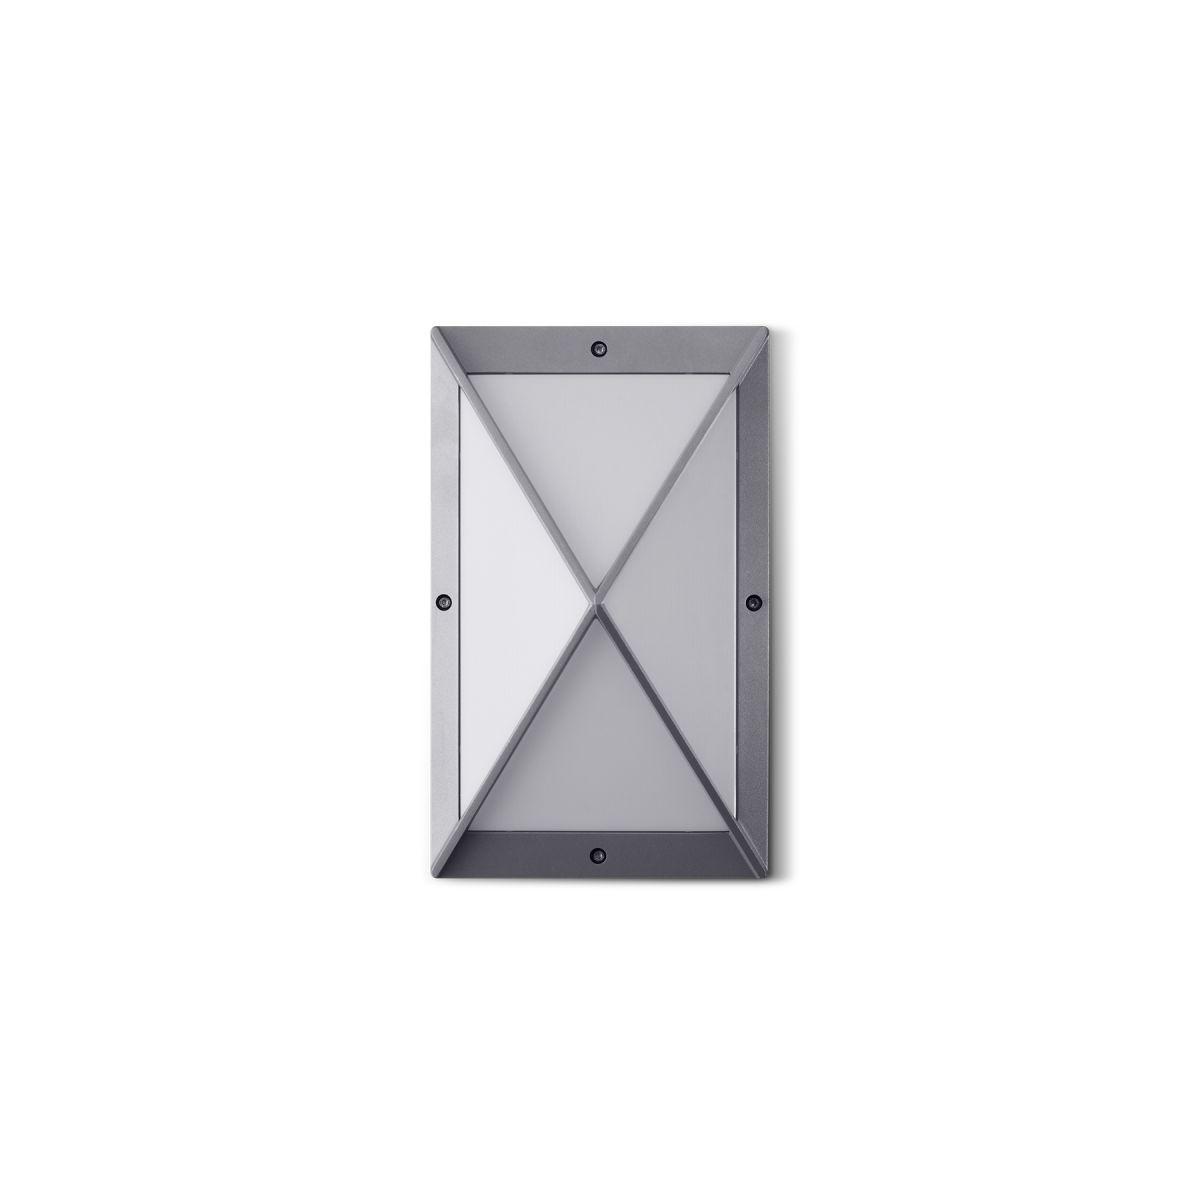 XEON Cross - Wall Light